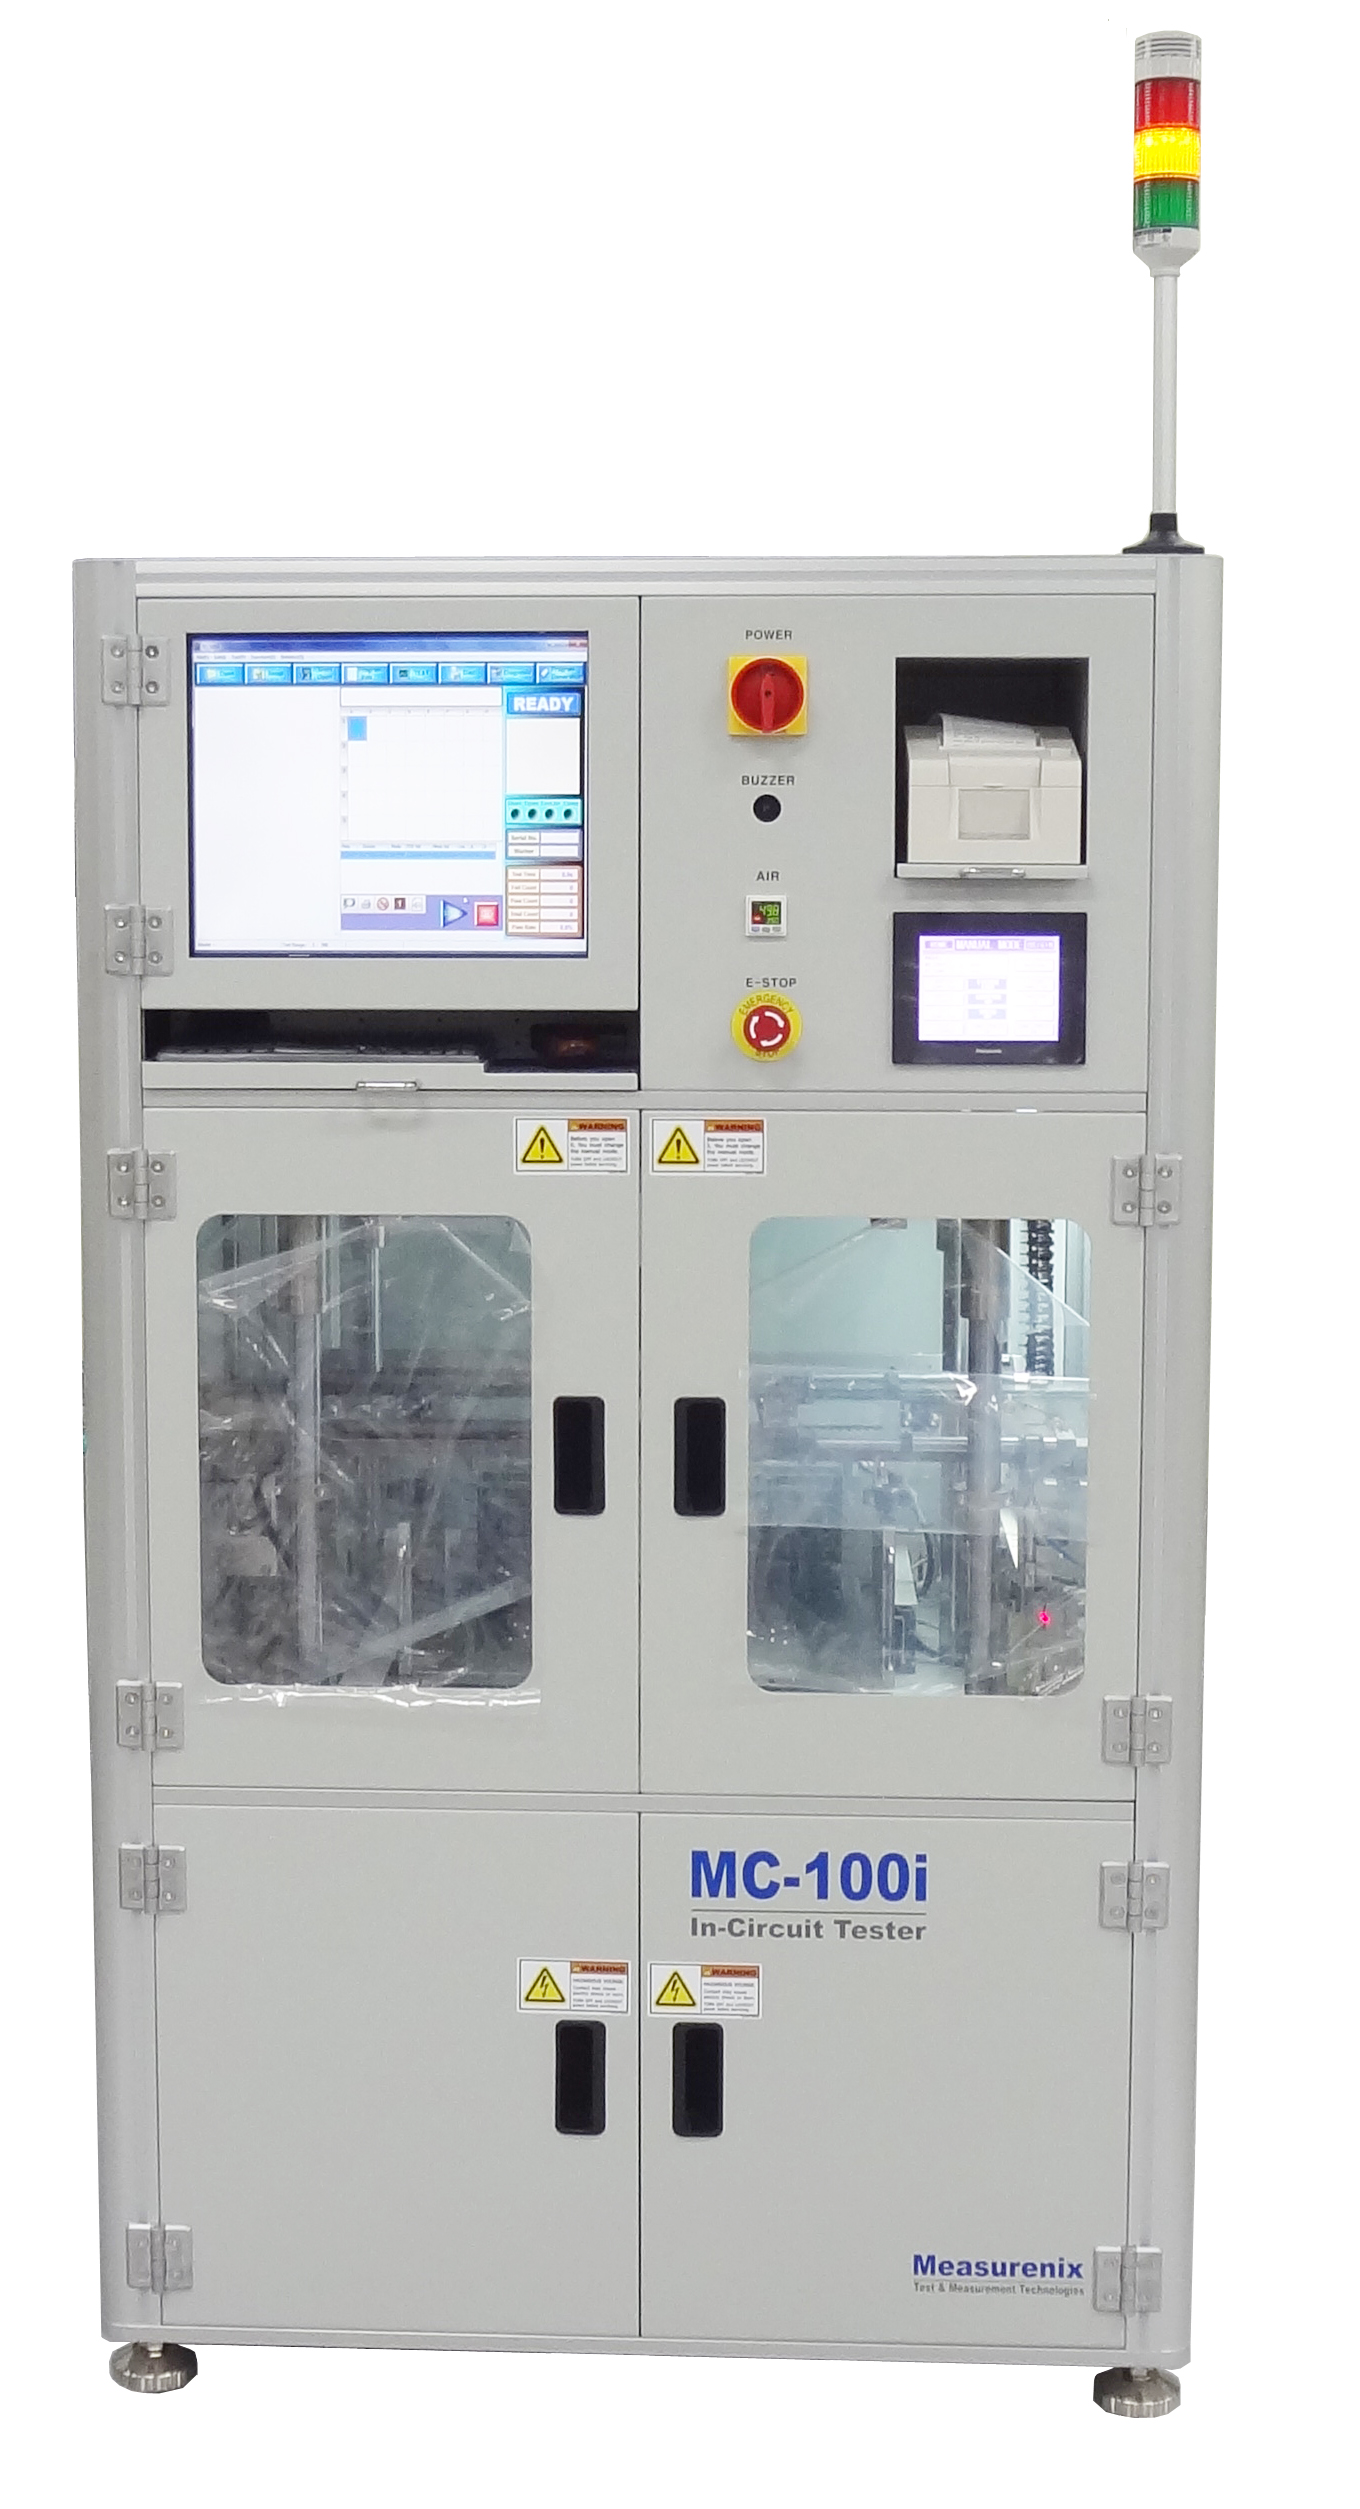 MC-100i